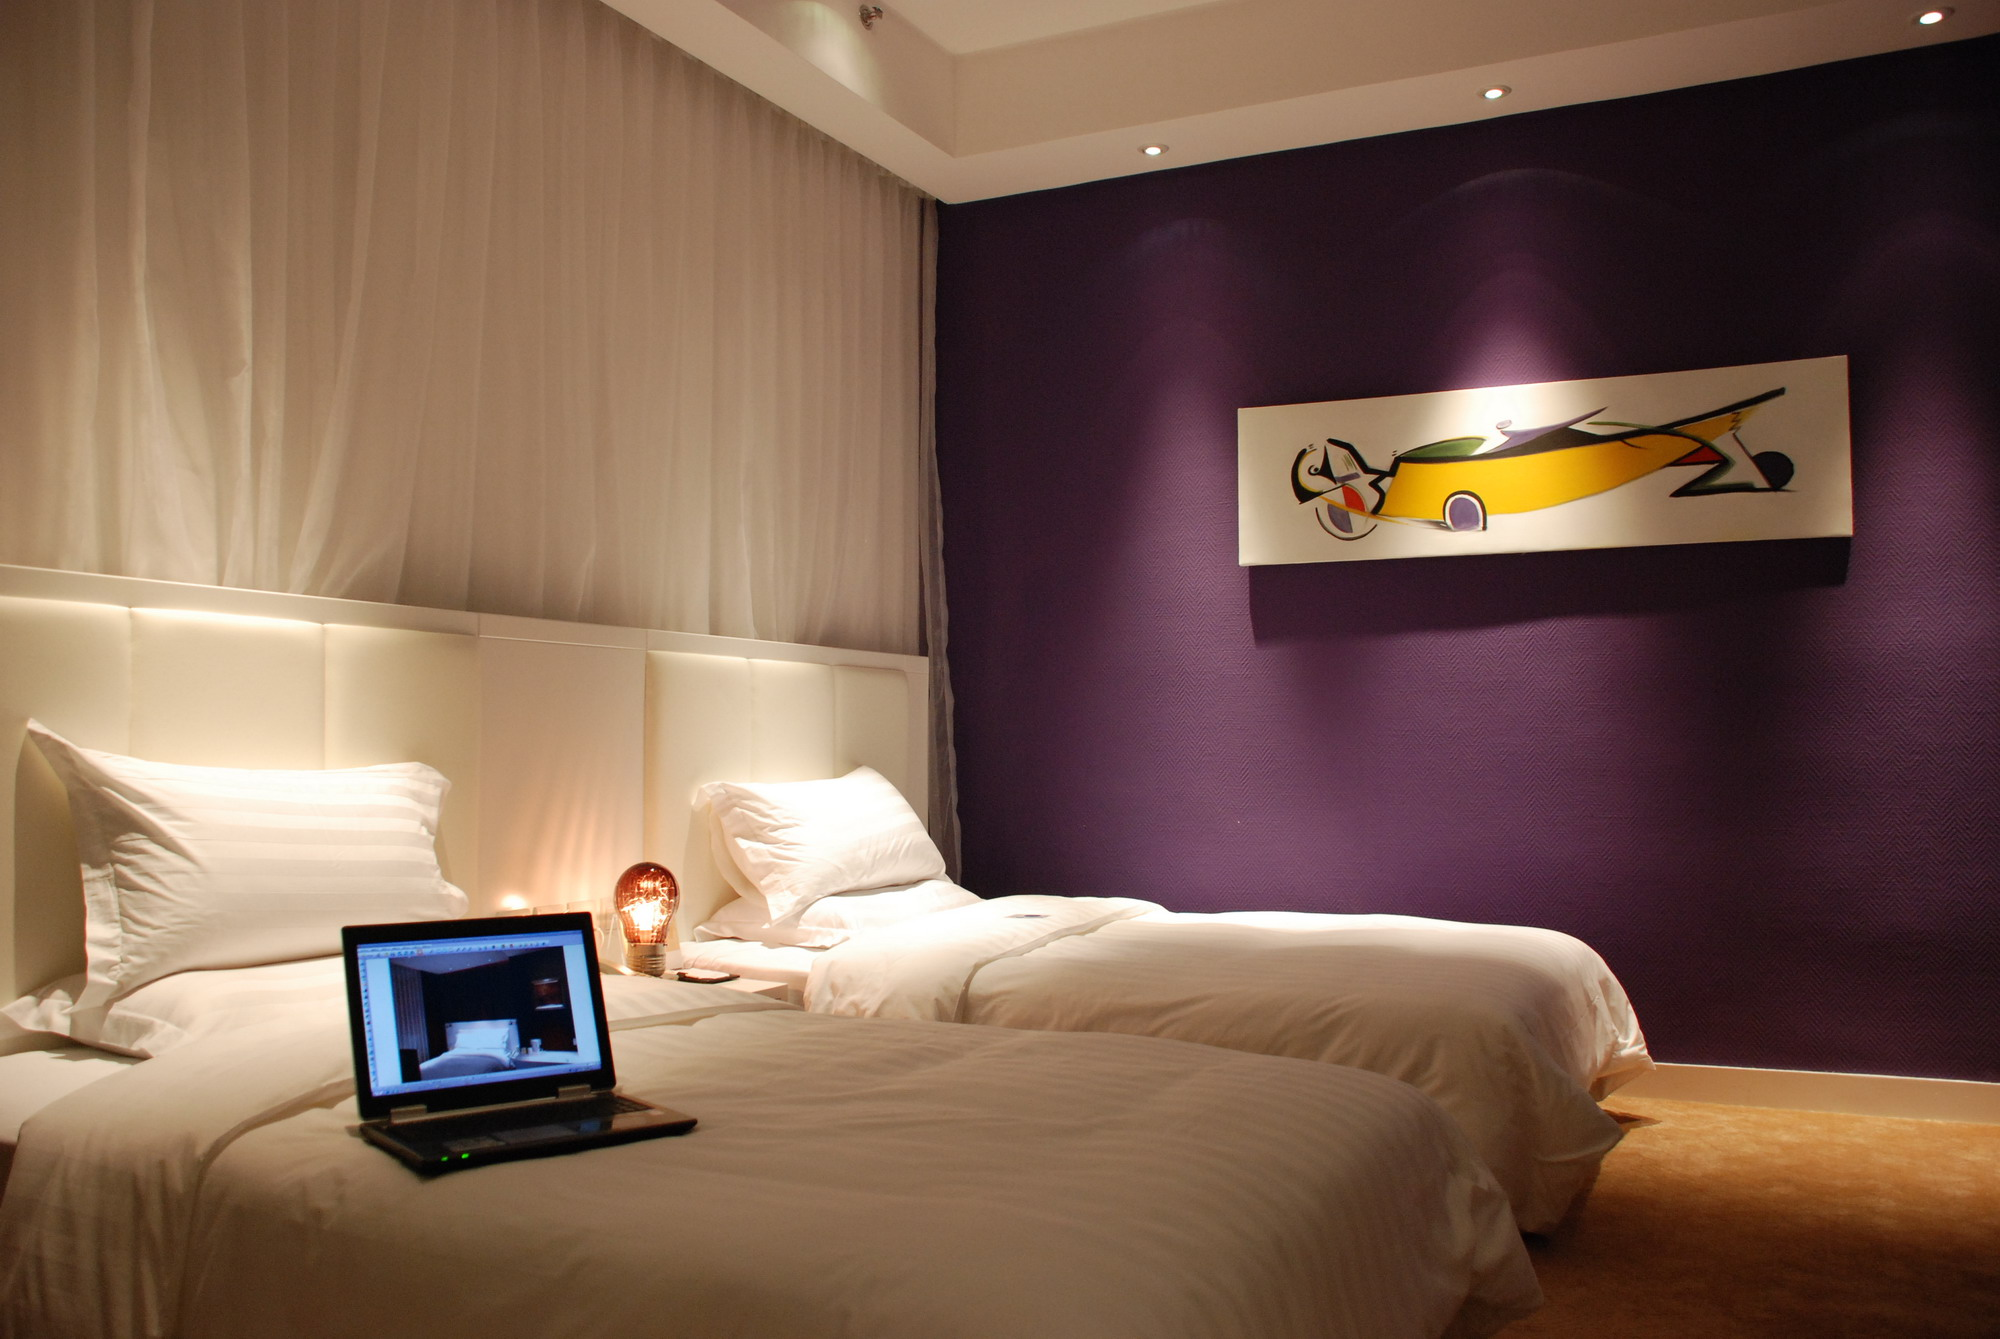 GHM First Hotel in Switzerland Appoints GM